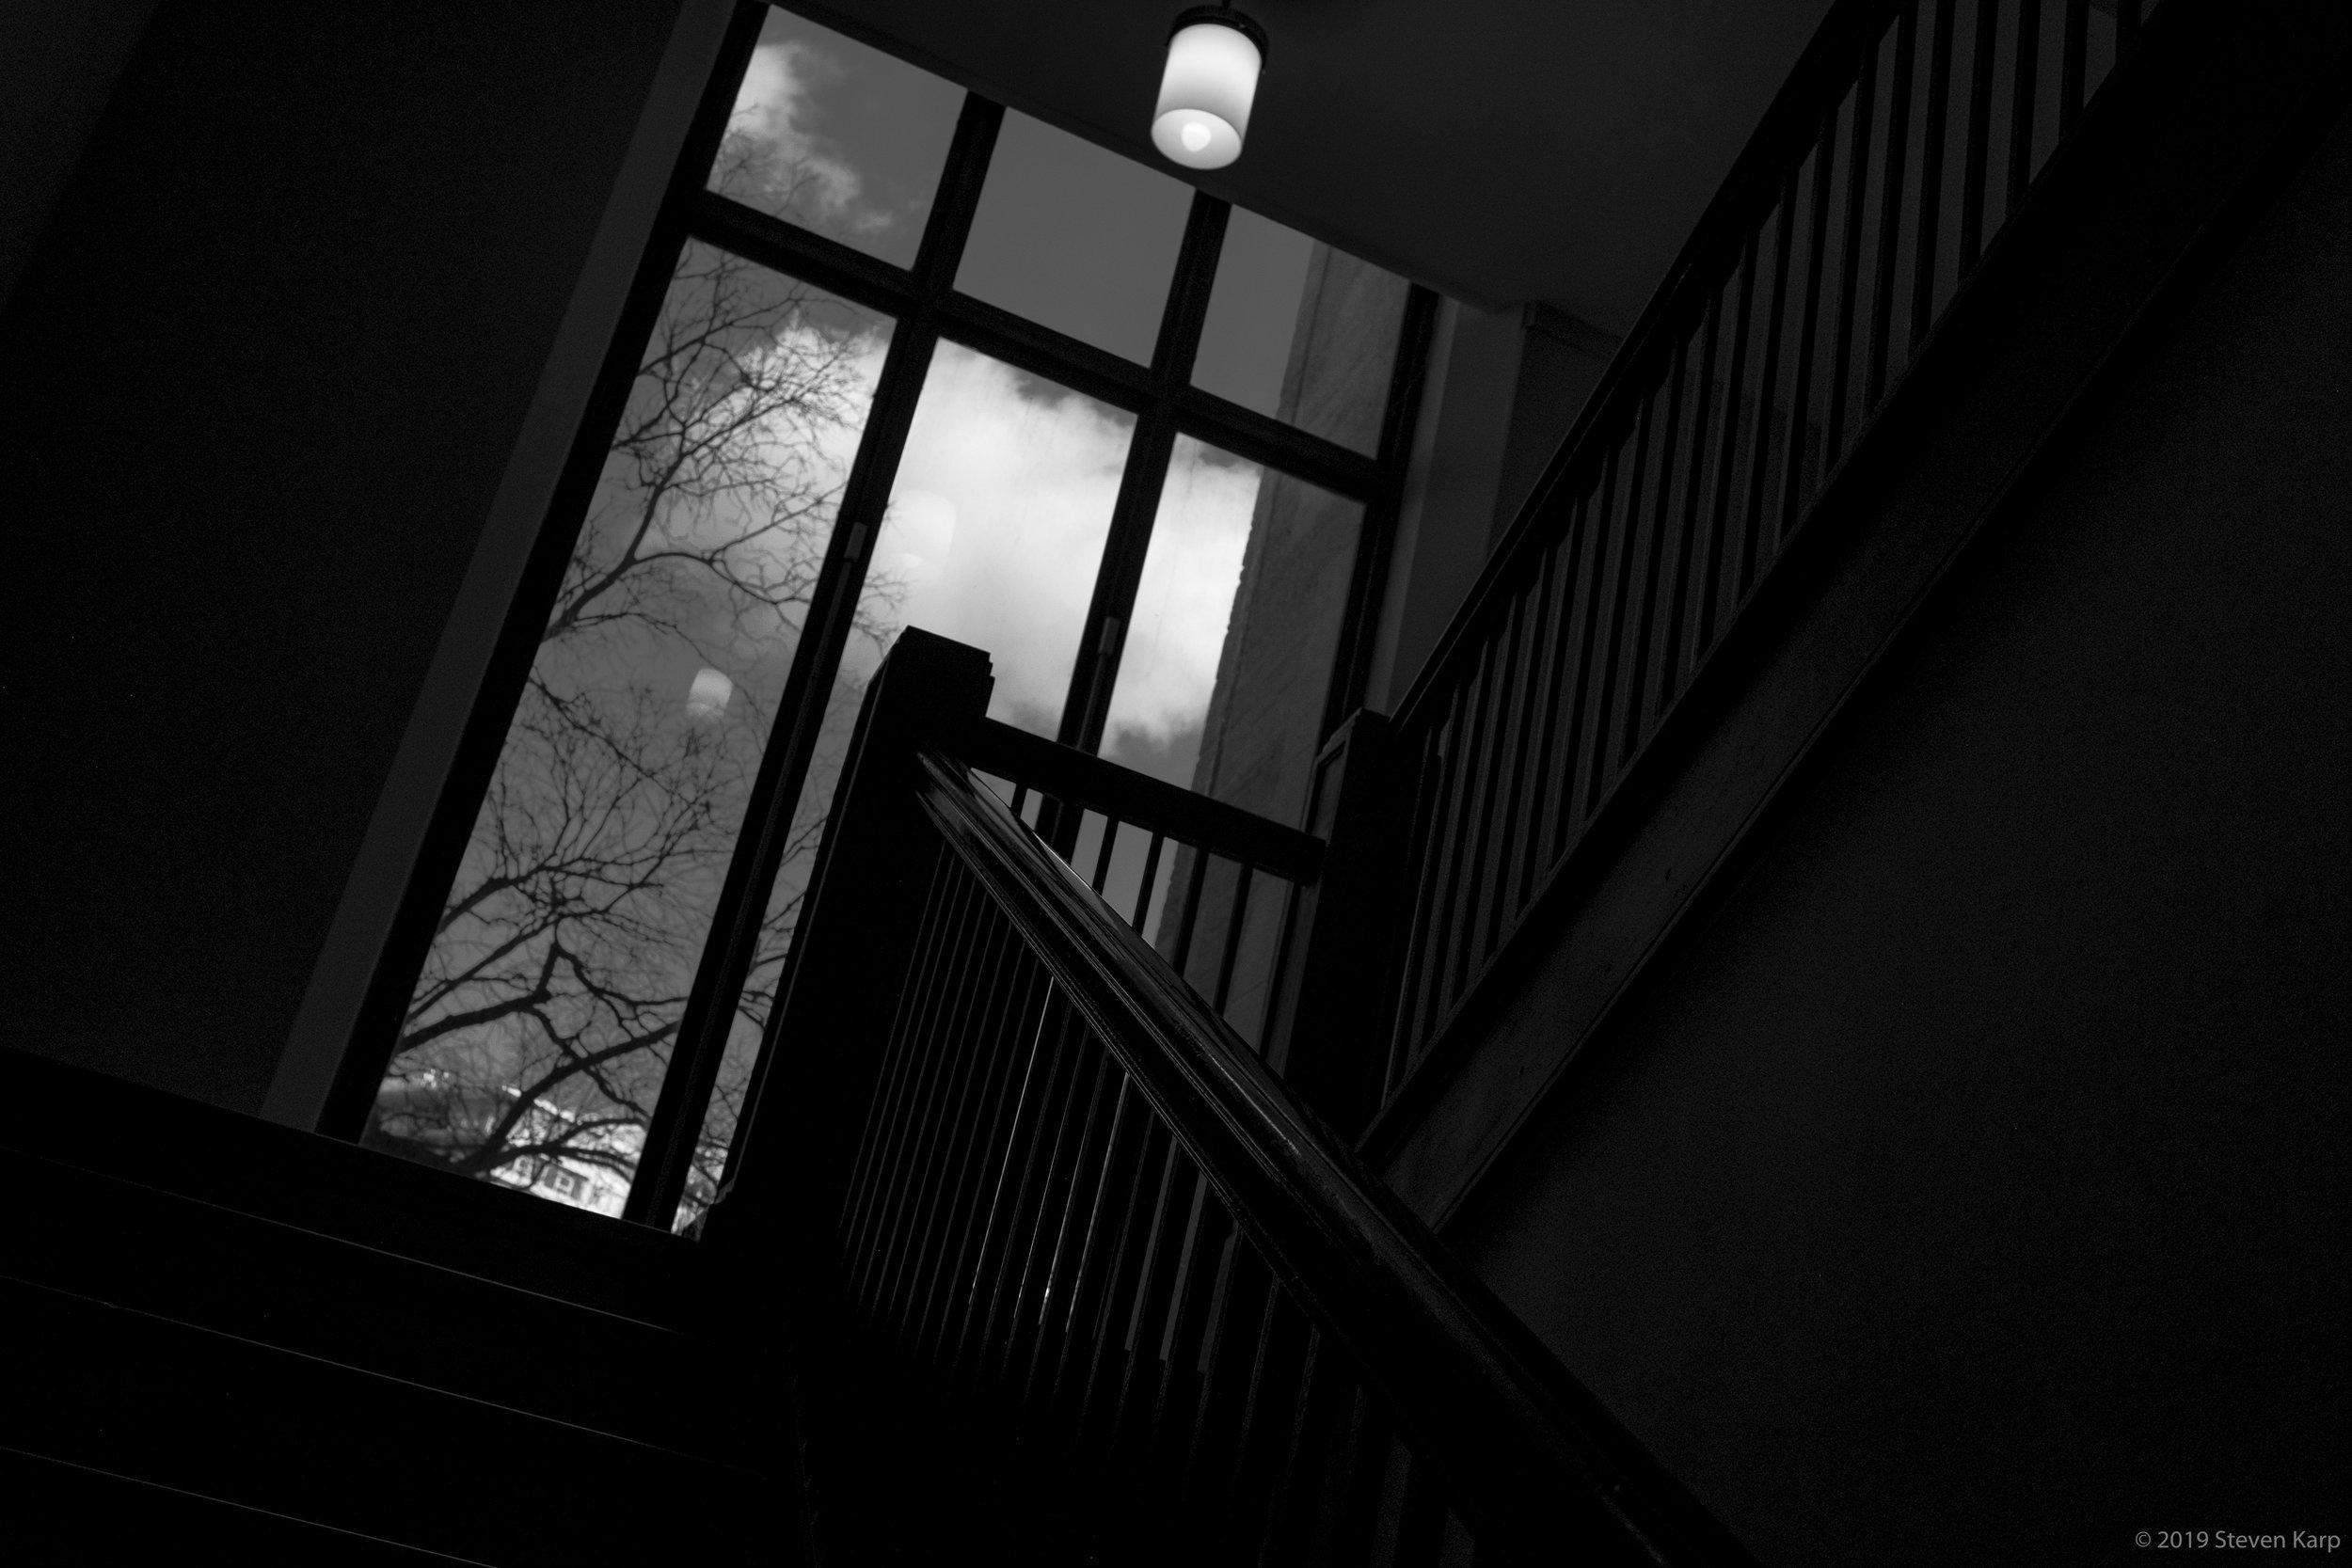 Lonely Staircase #2 ©2019 Steven Karp